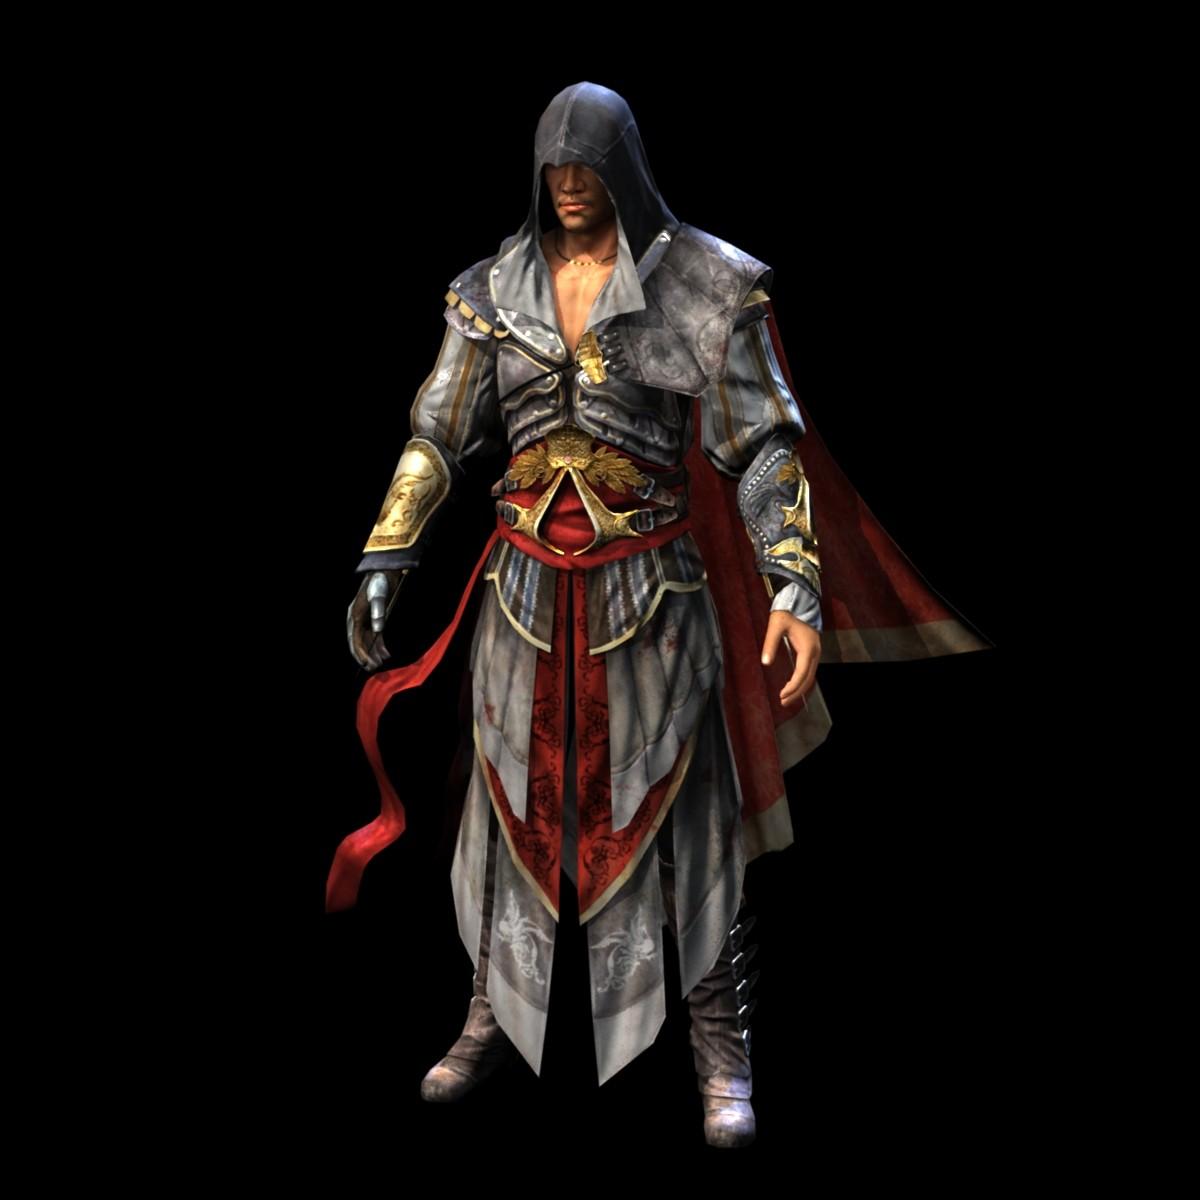 Ezio audiεκέσκο προφίλ γνωριμιών